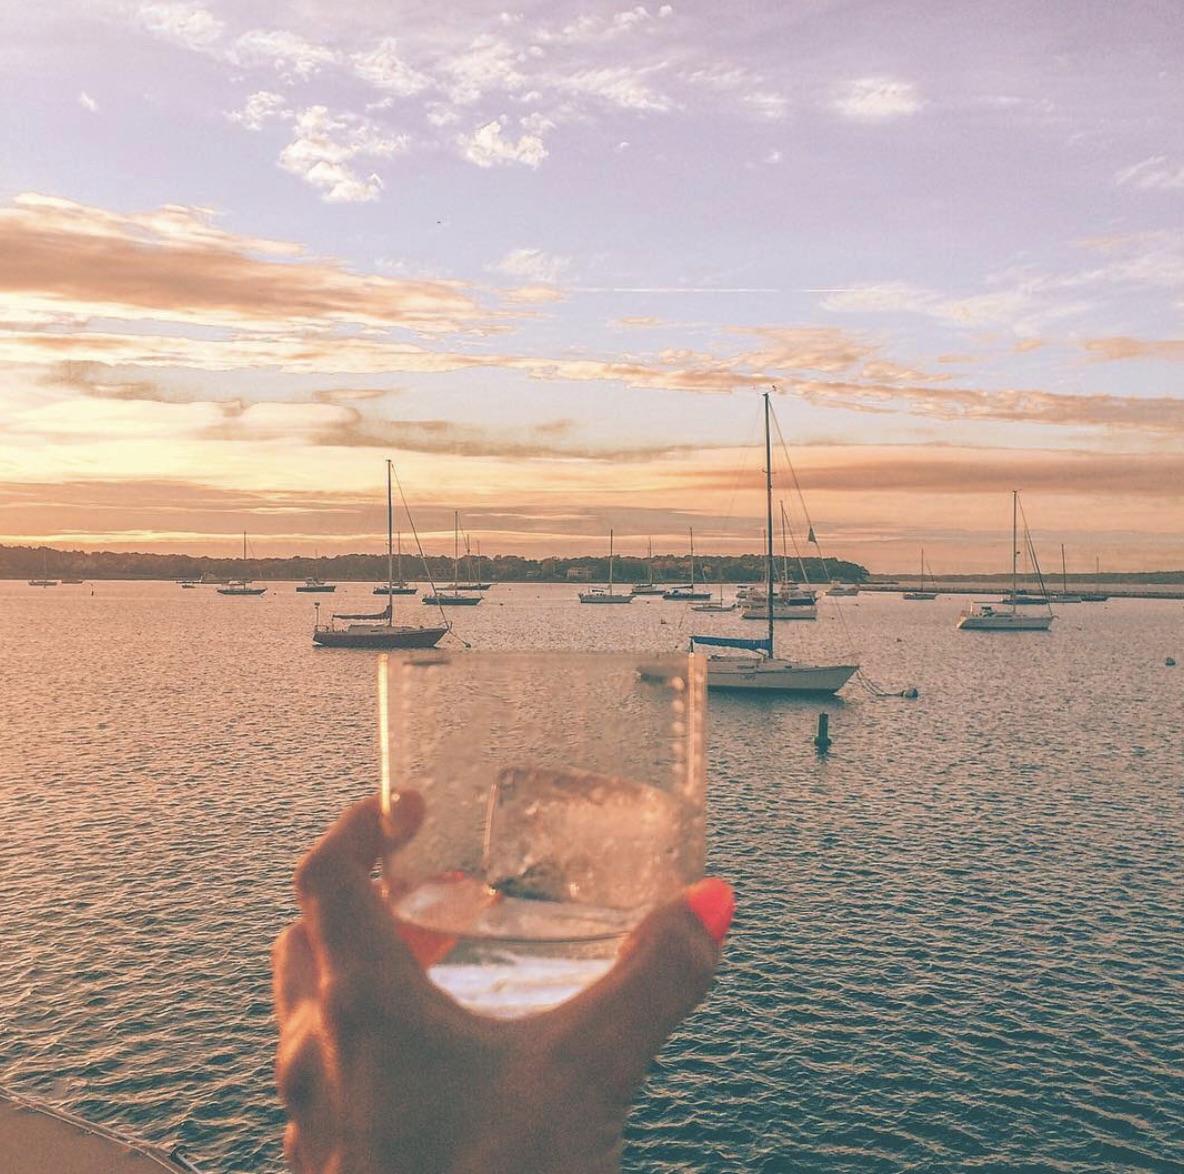 instagram Drink on waterfront